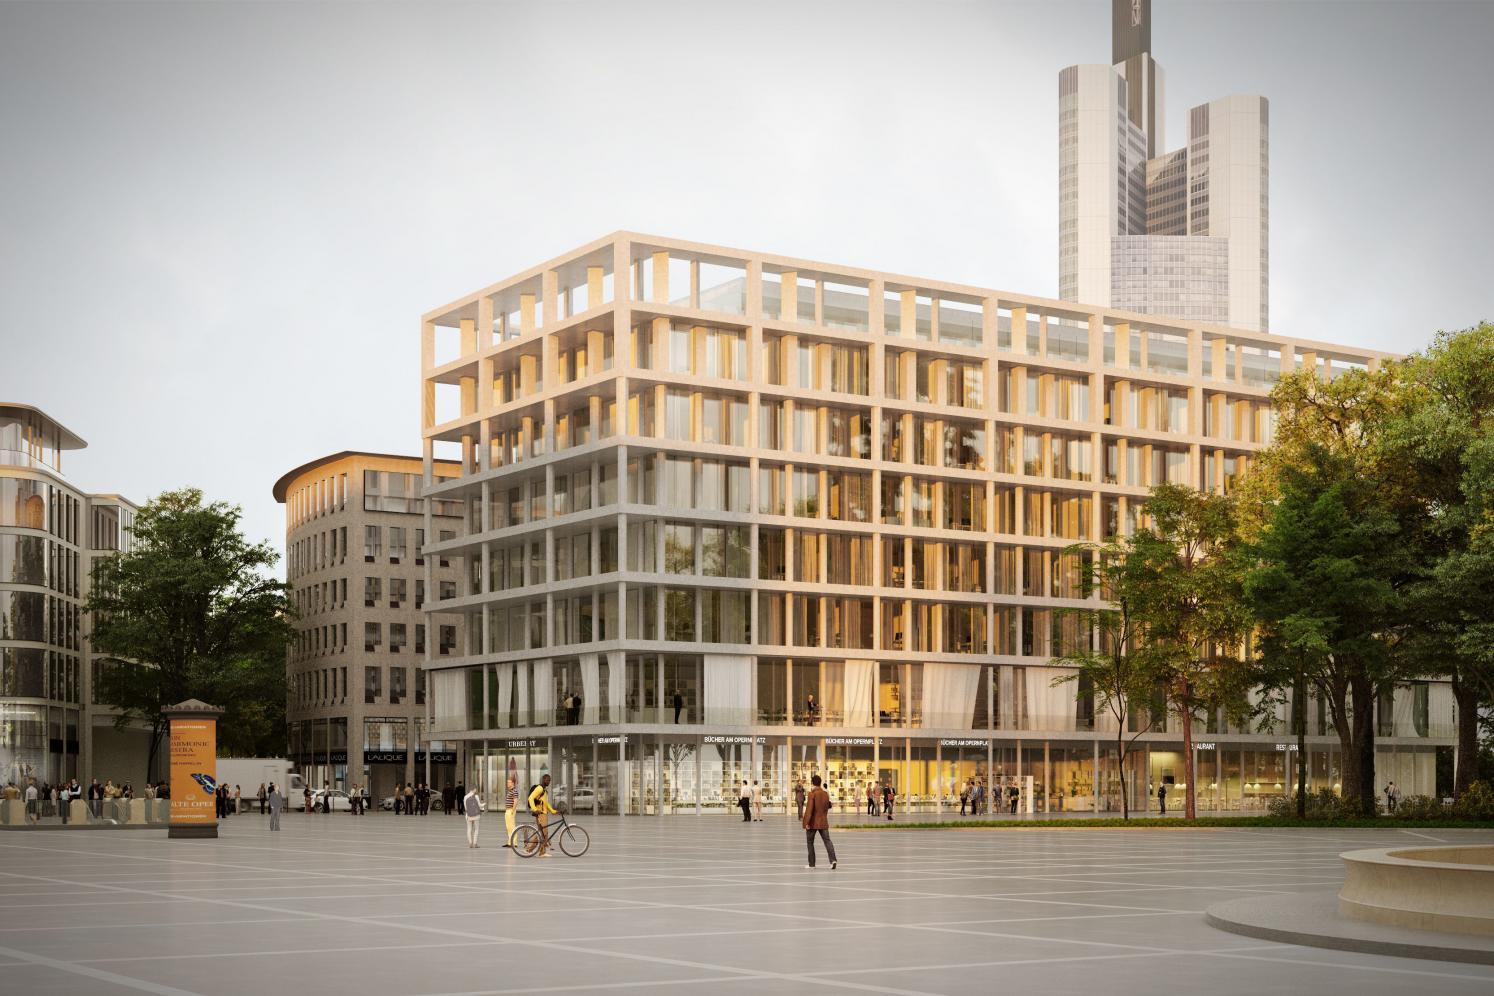 3 preis f r opernplatz 2 frankfurt am main knippers helbig advanced engineering. Black Bedroom Furniture Sets. Home Design Ideas